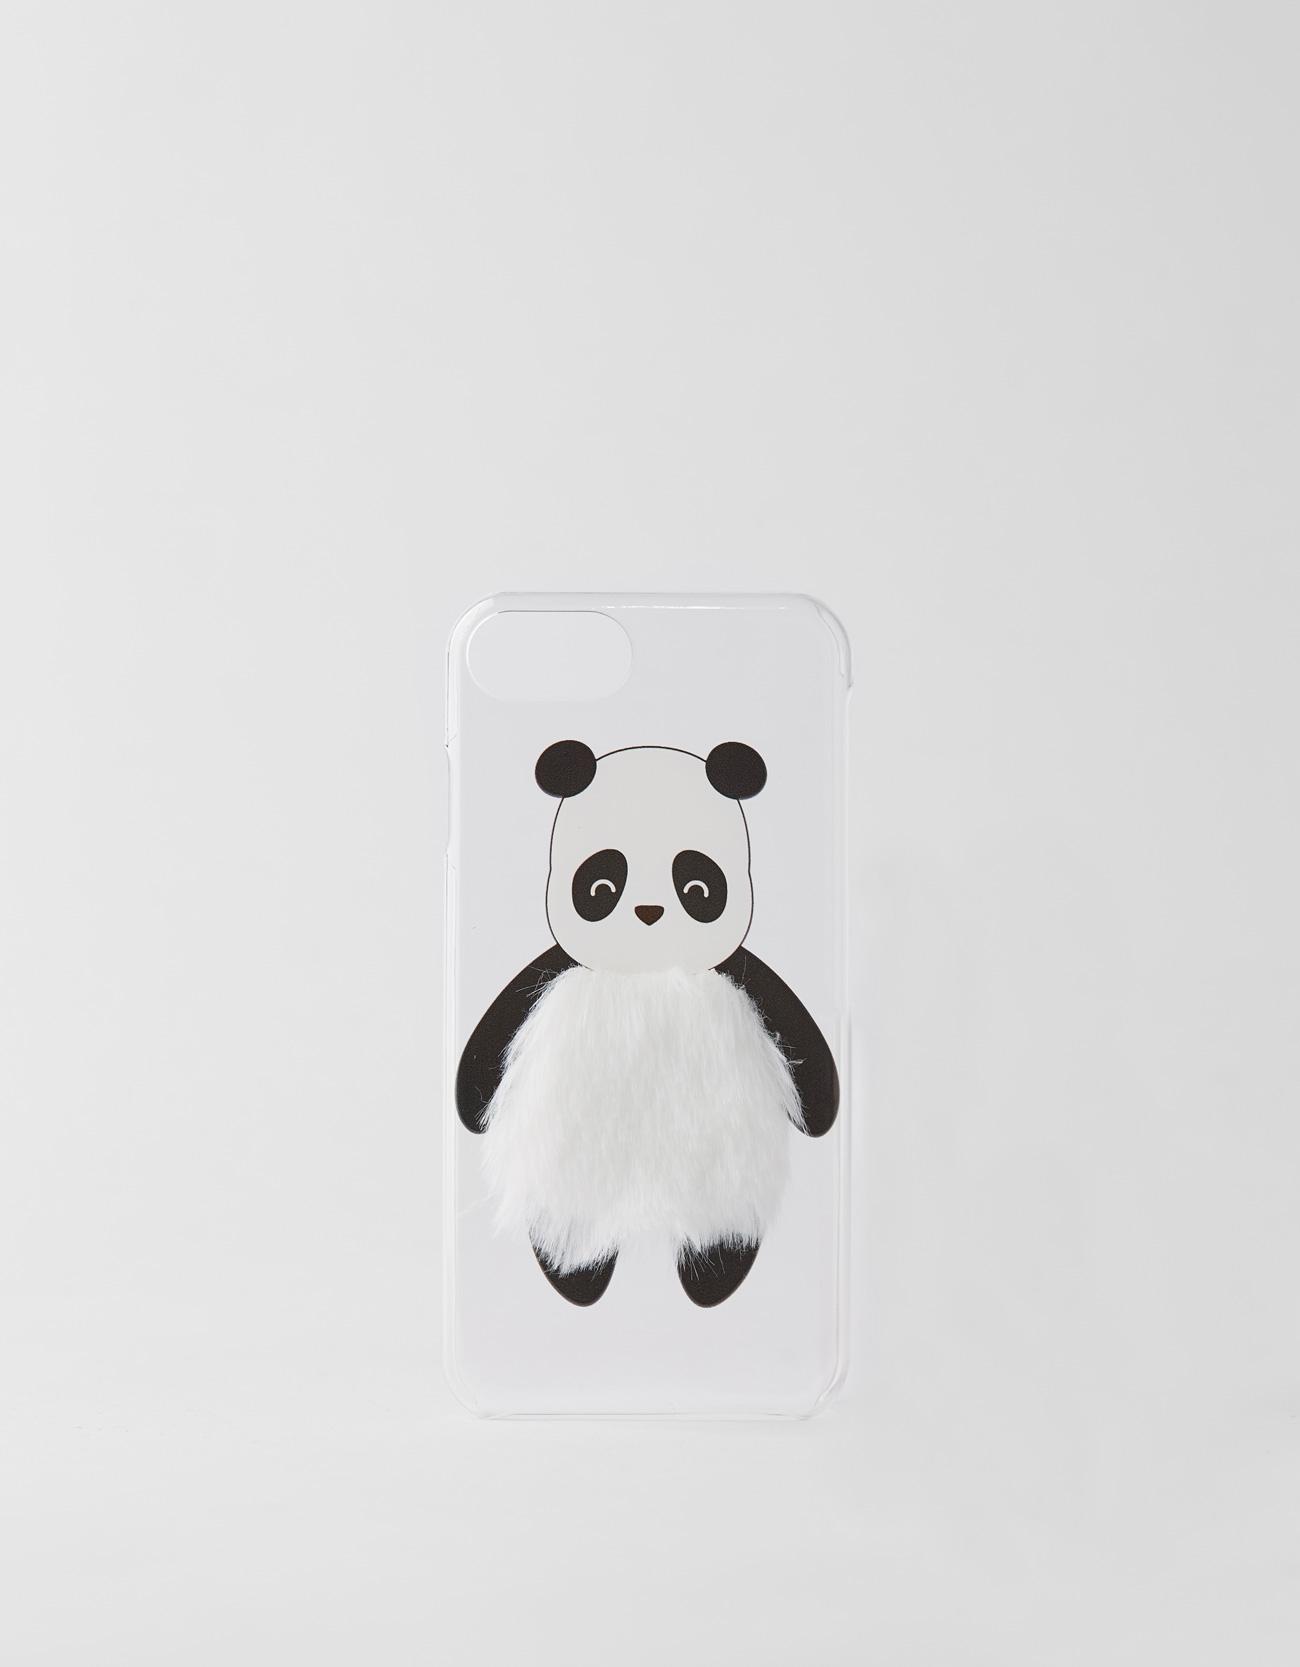 panda case iphone 6s